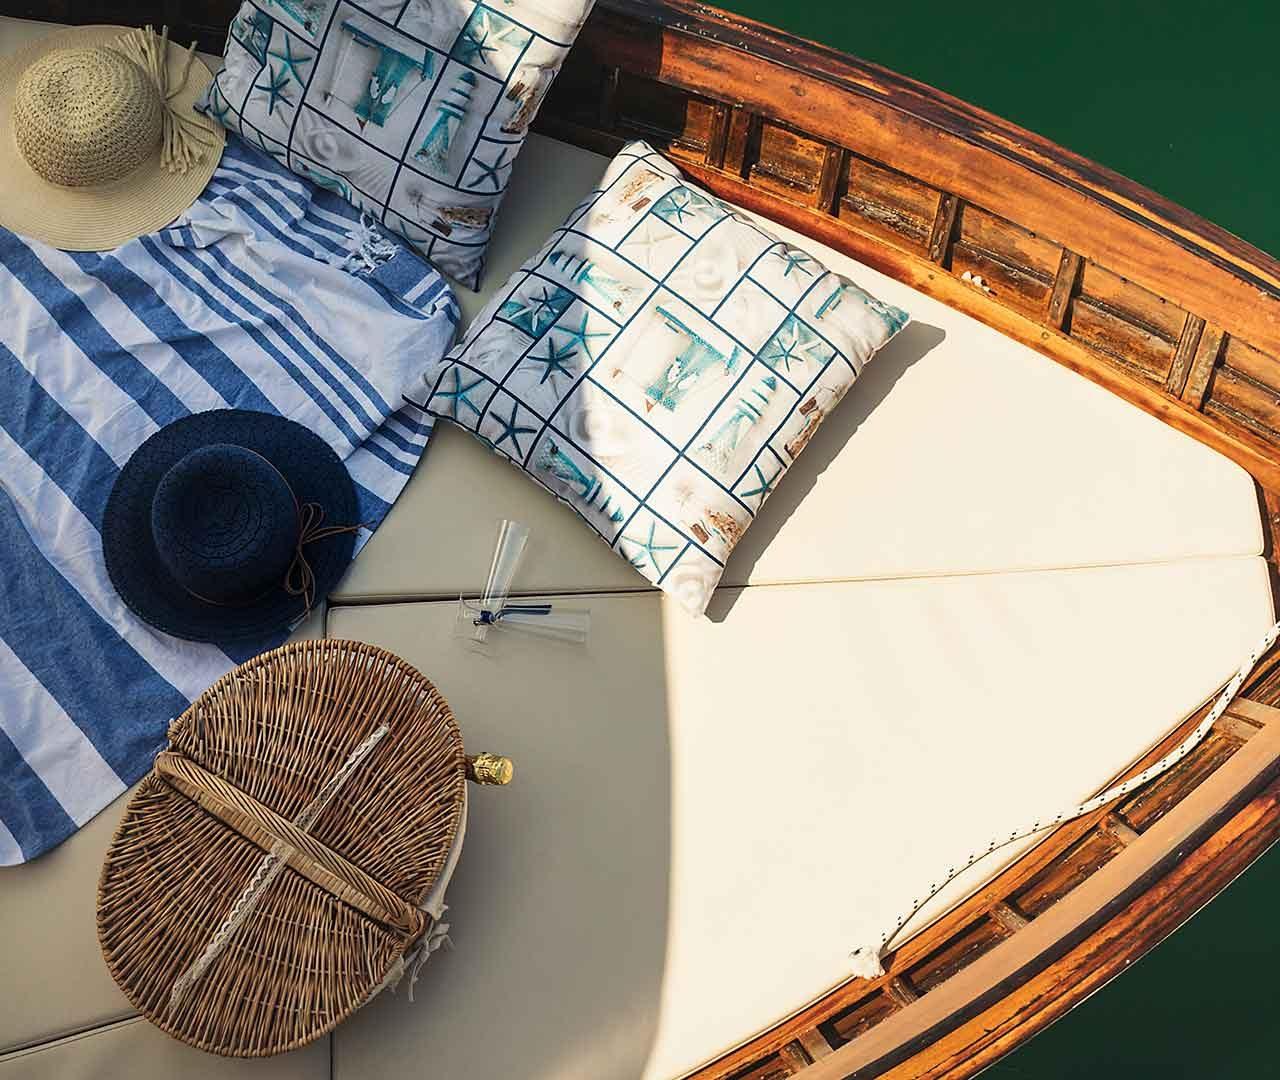 gozzo-in-legno-seaward-noleggio-monopoli2